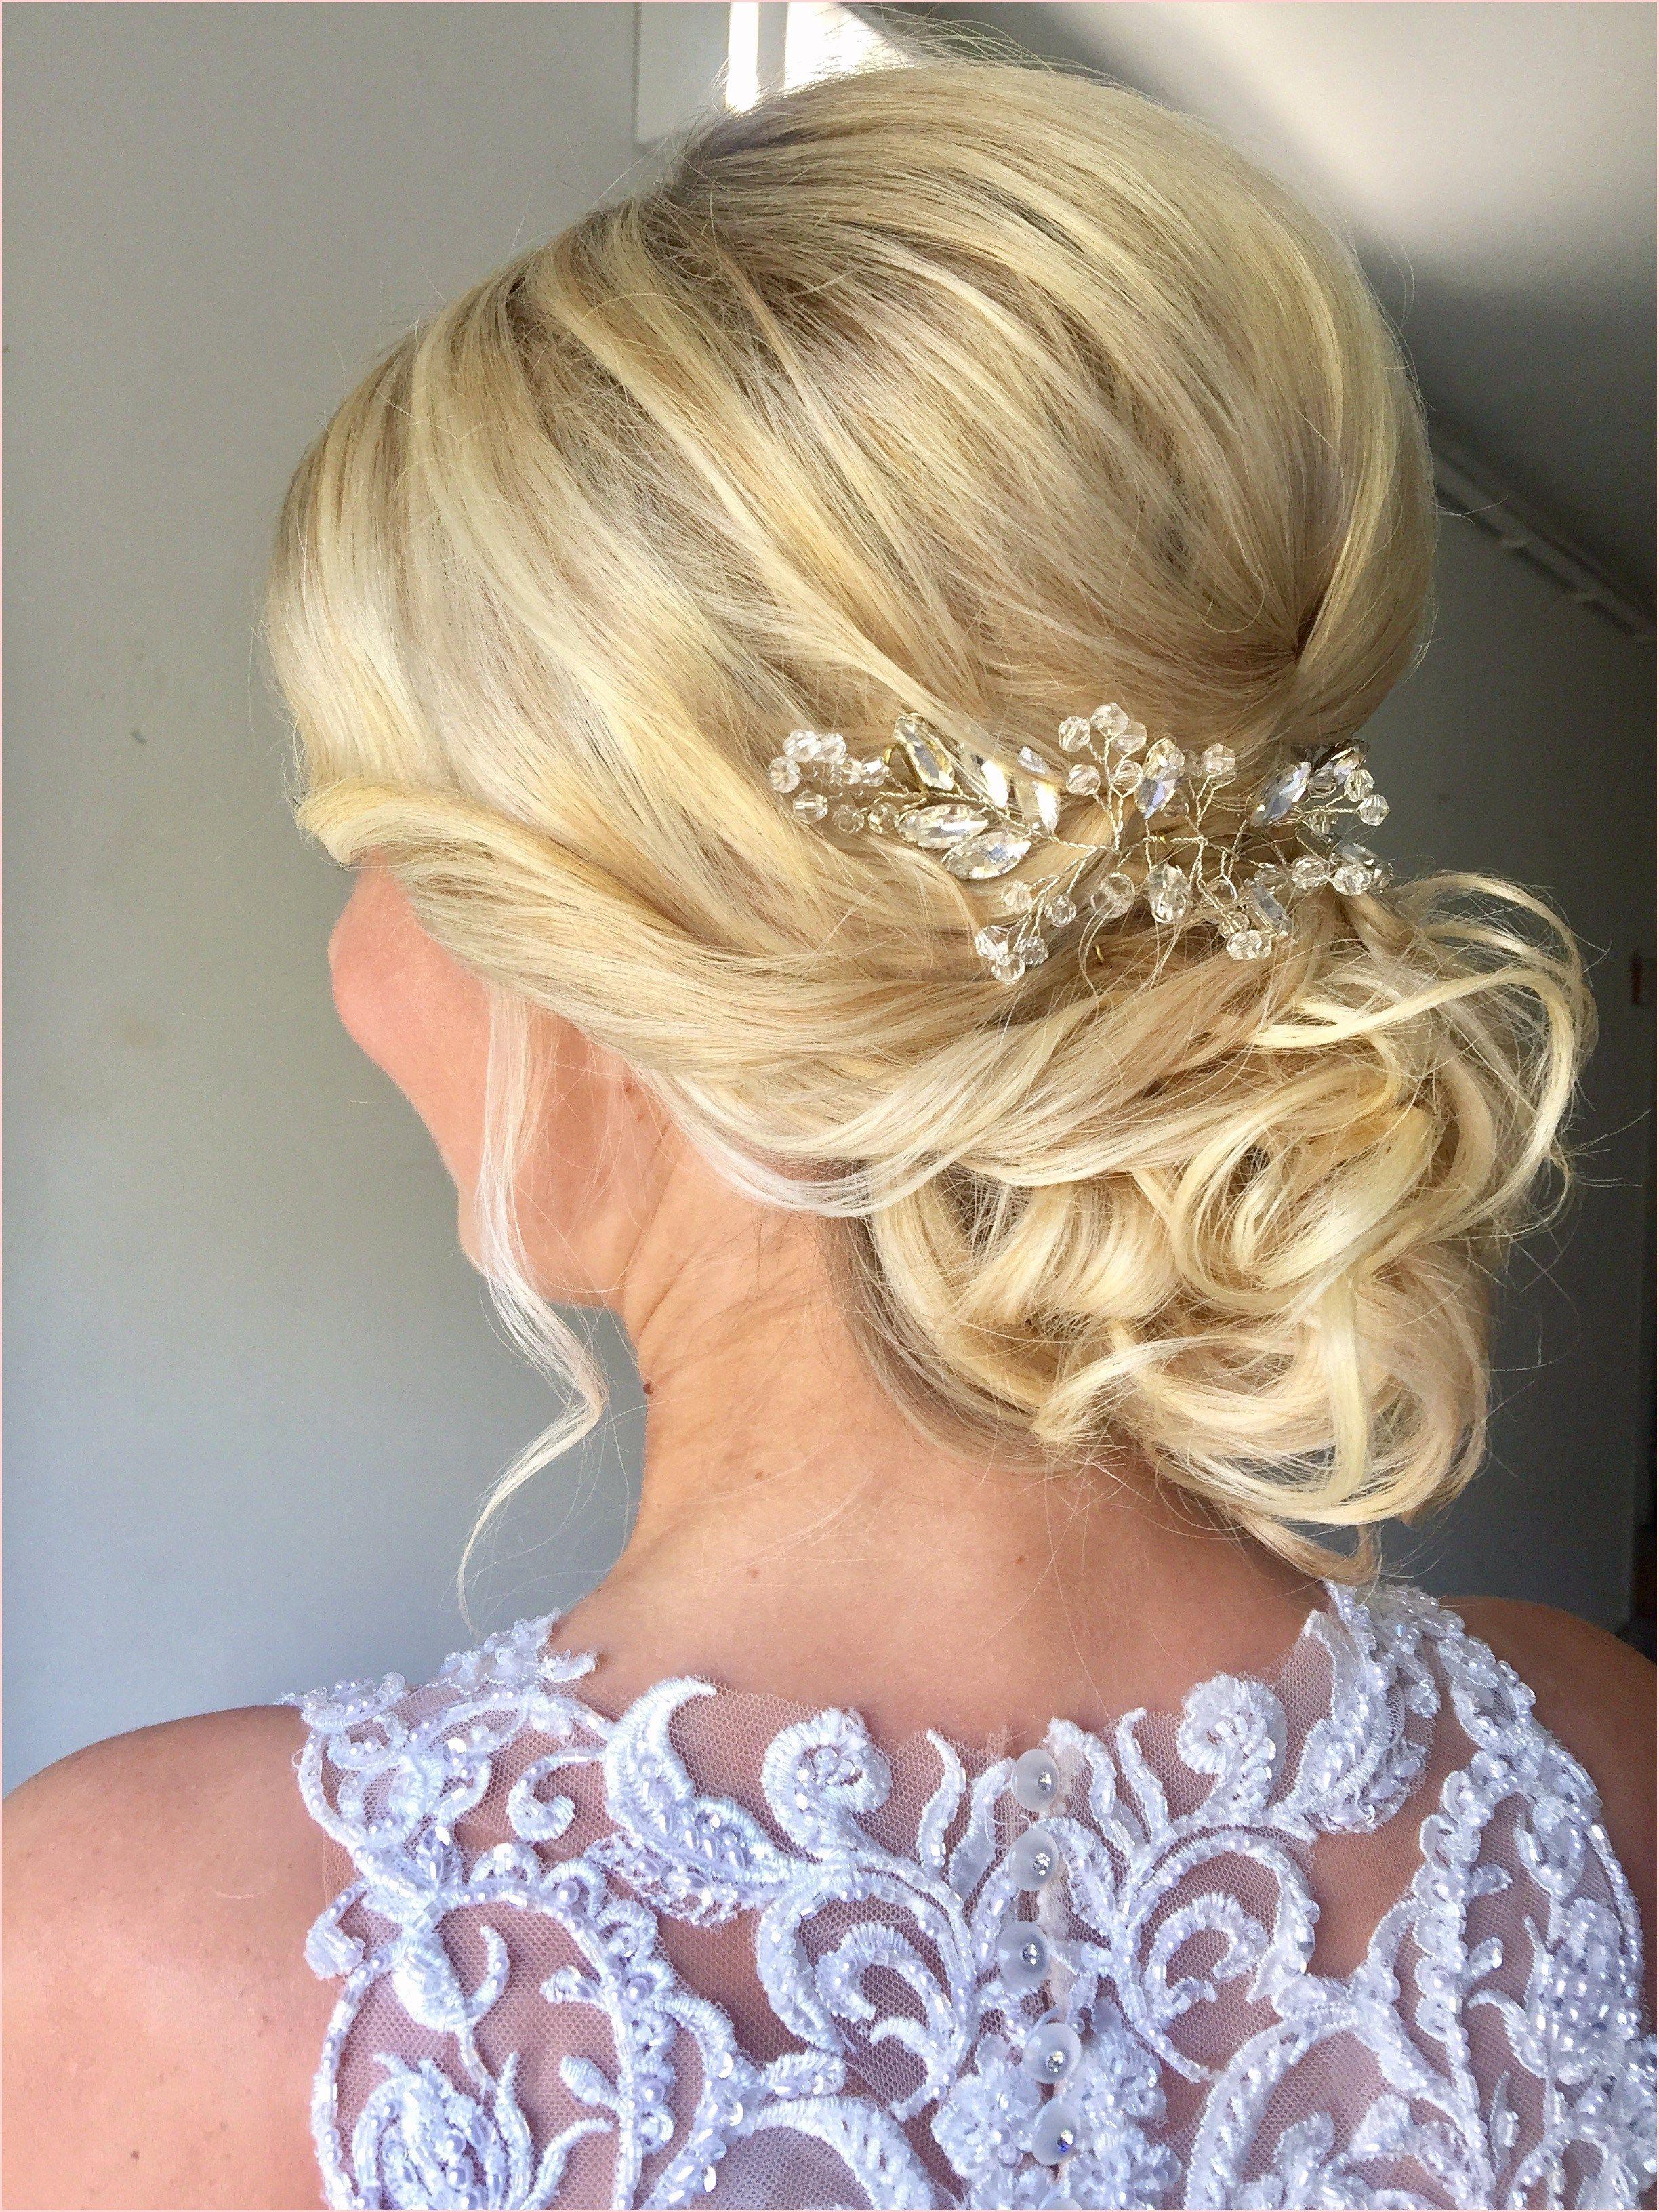 Brautfrisuren Lange Haare Offen Locken  Brautfrisuren lange haare